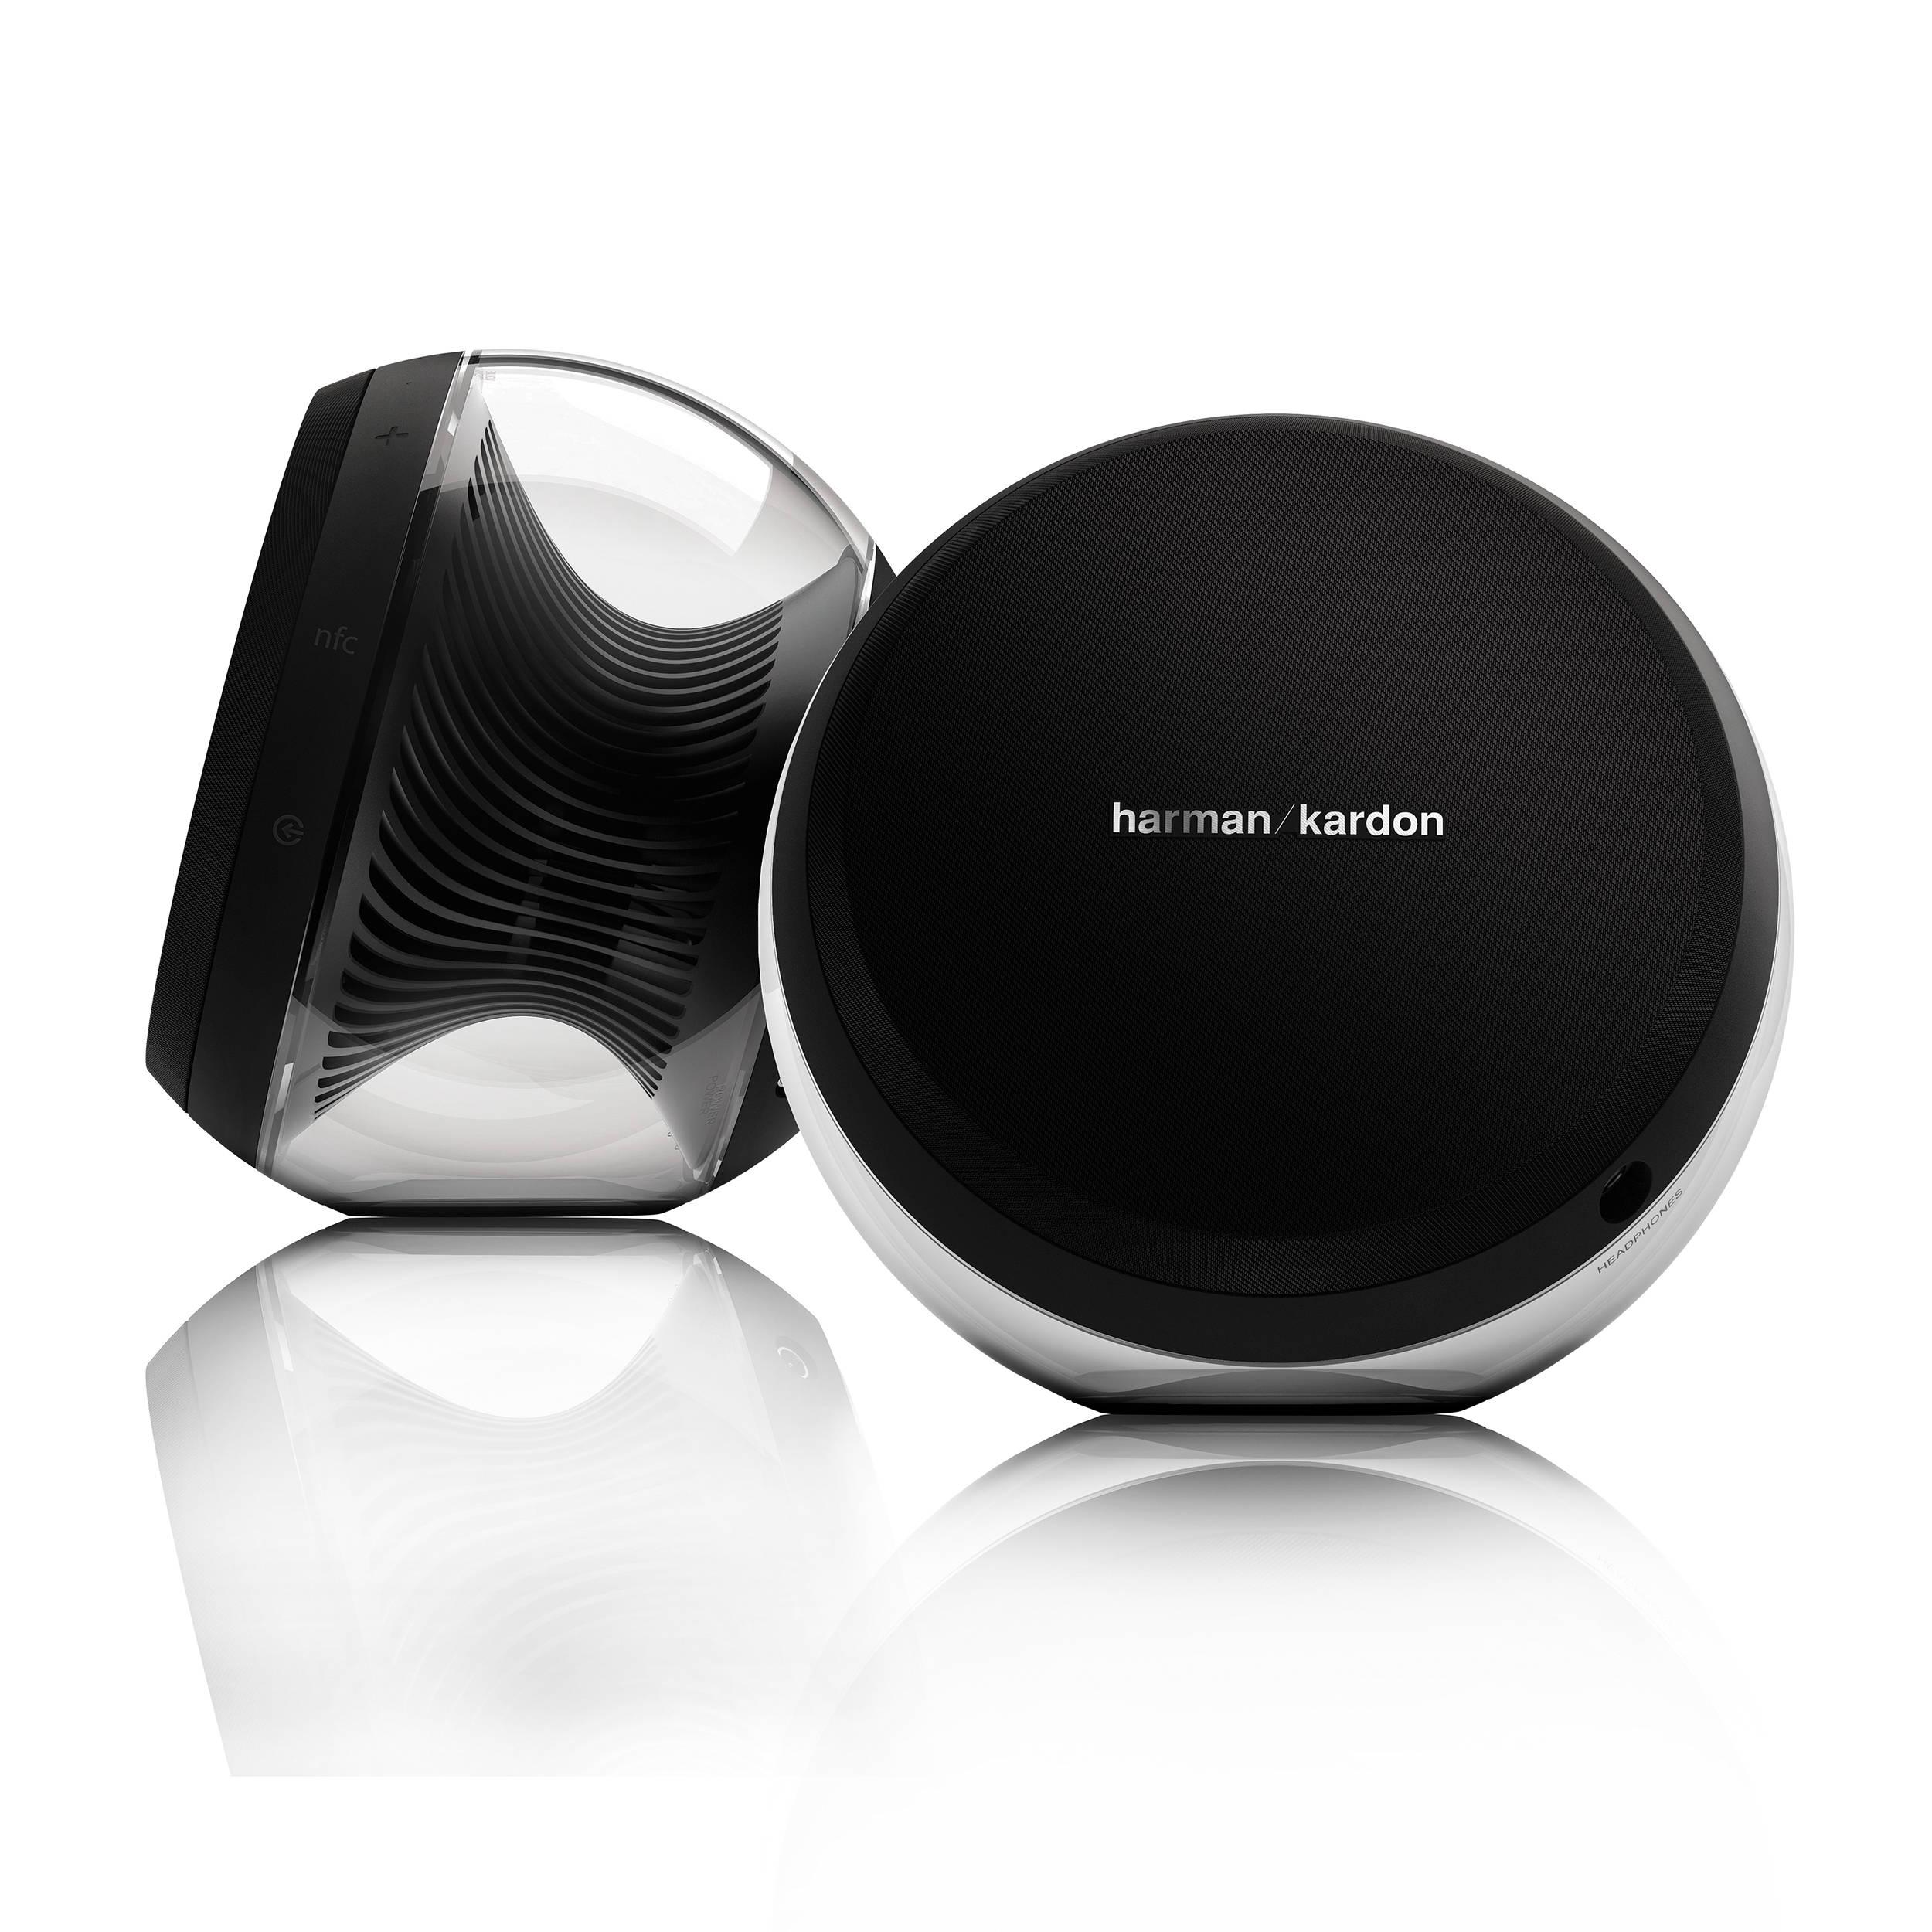 harman kardon nova wireless stereo speaker system hknovablkam. Black Bedroom Furniture Sets. Home Design Ideas